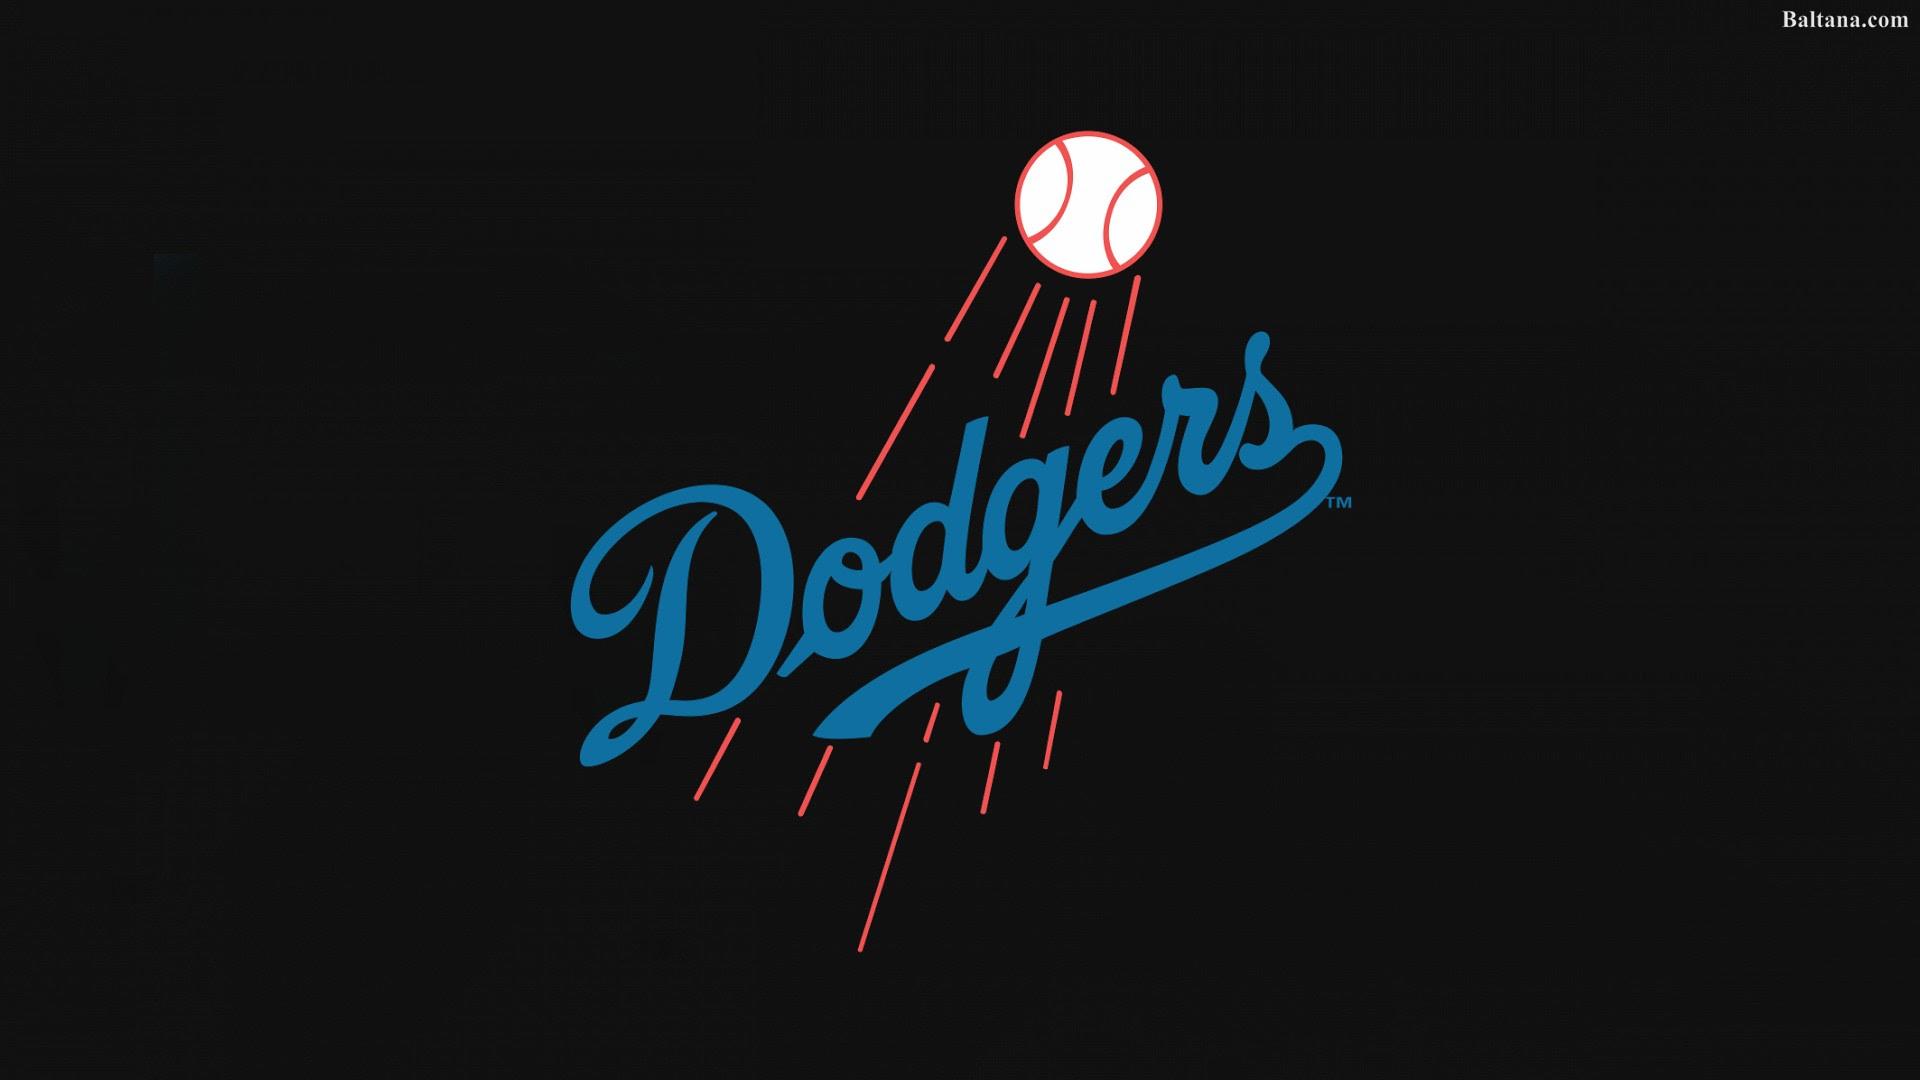 Los Angeles Dodgers Background Wallpaper 33153 Baltana